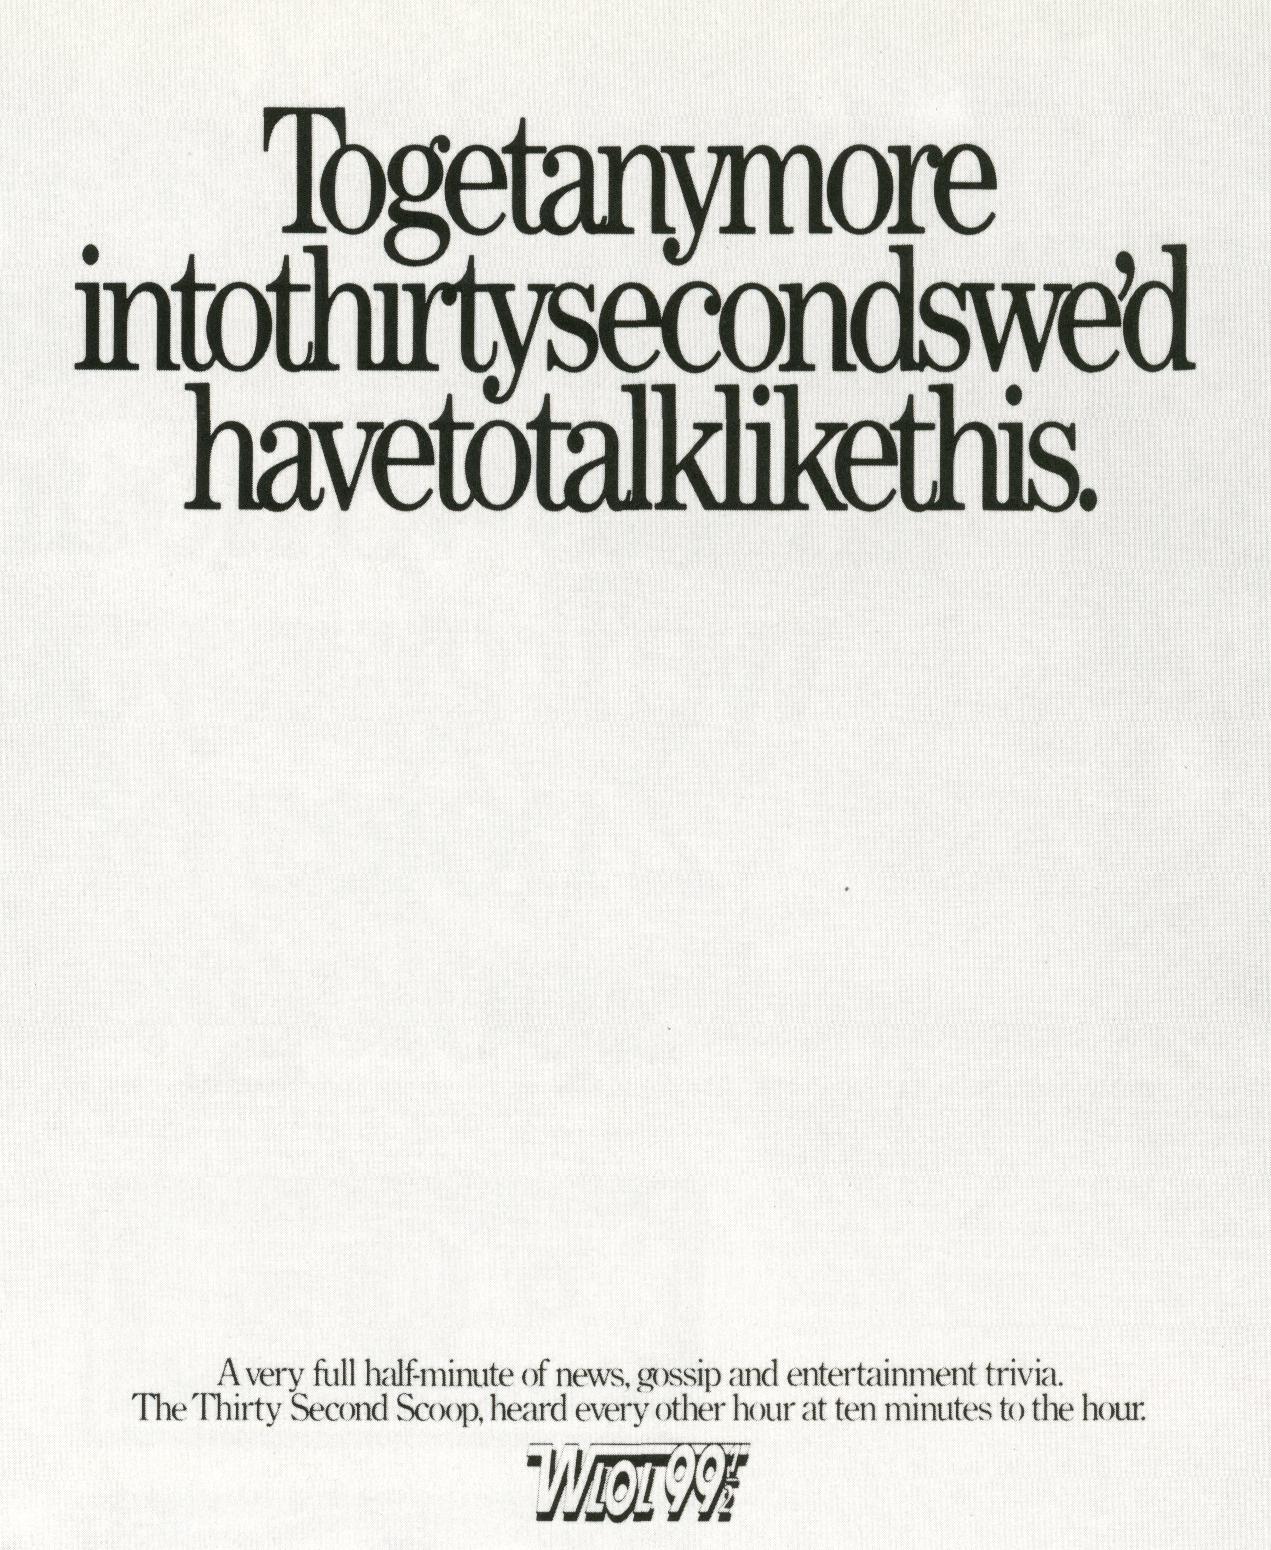 Fallon McElligott, 'Squeezed Type'-01